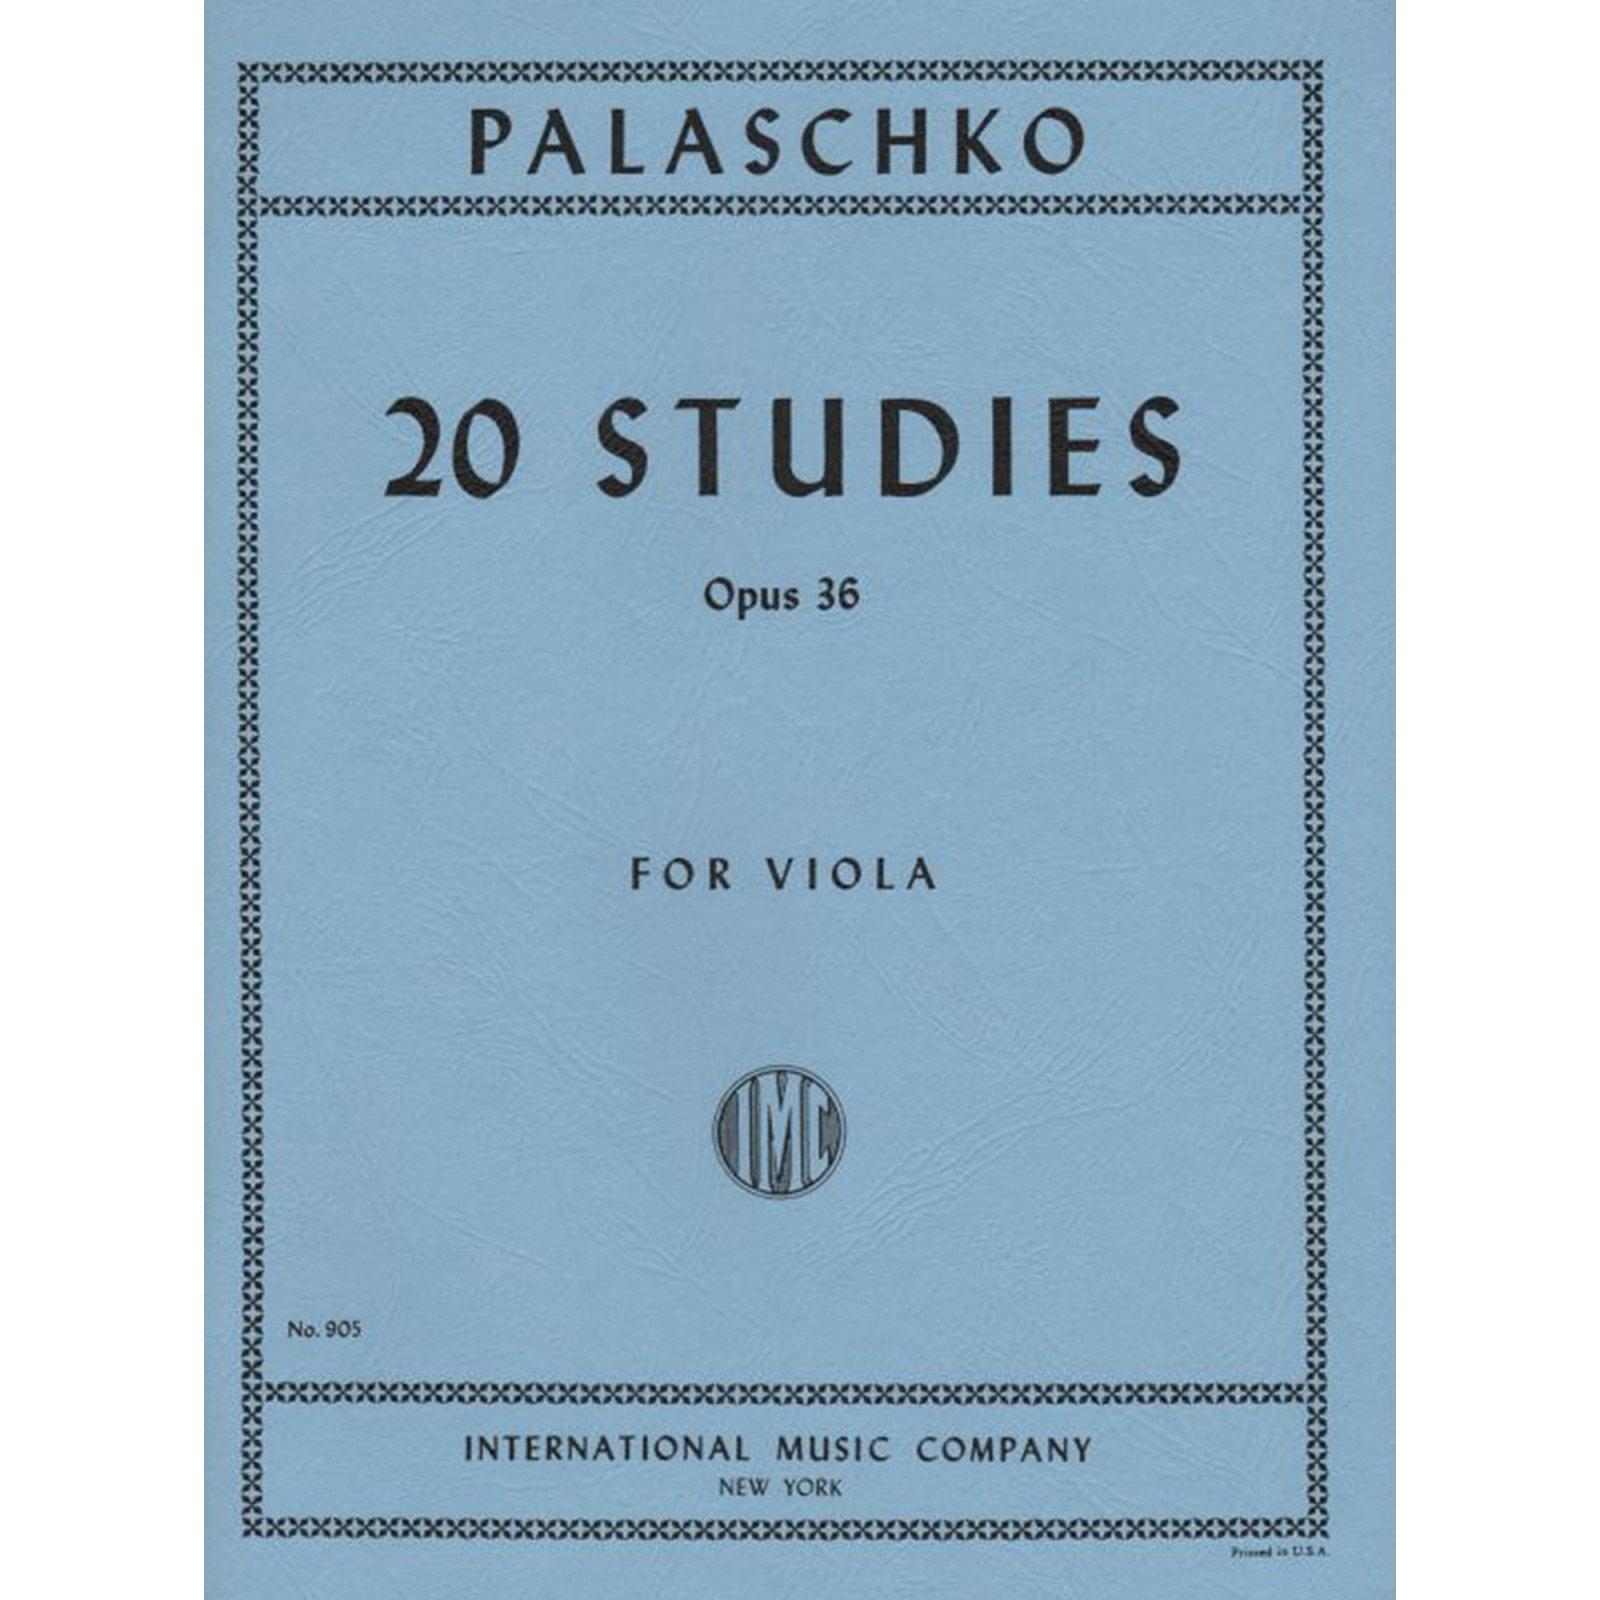 Palaschko: 20 Studies Op. 36